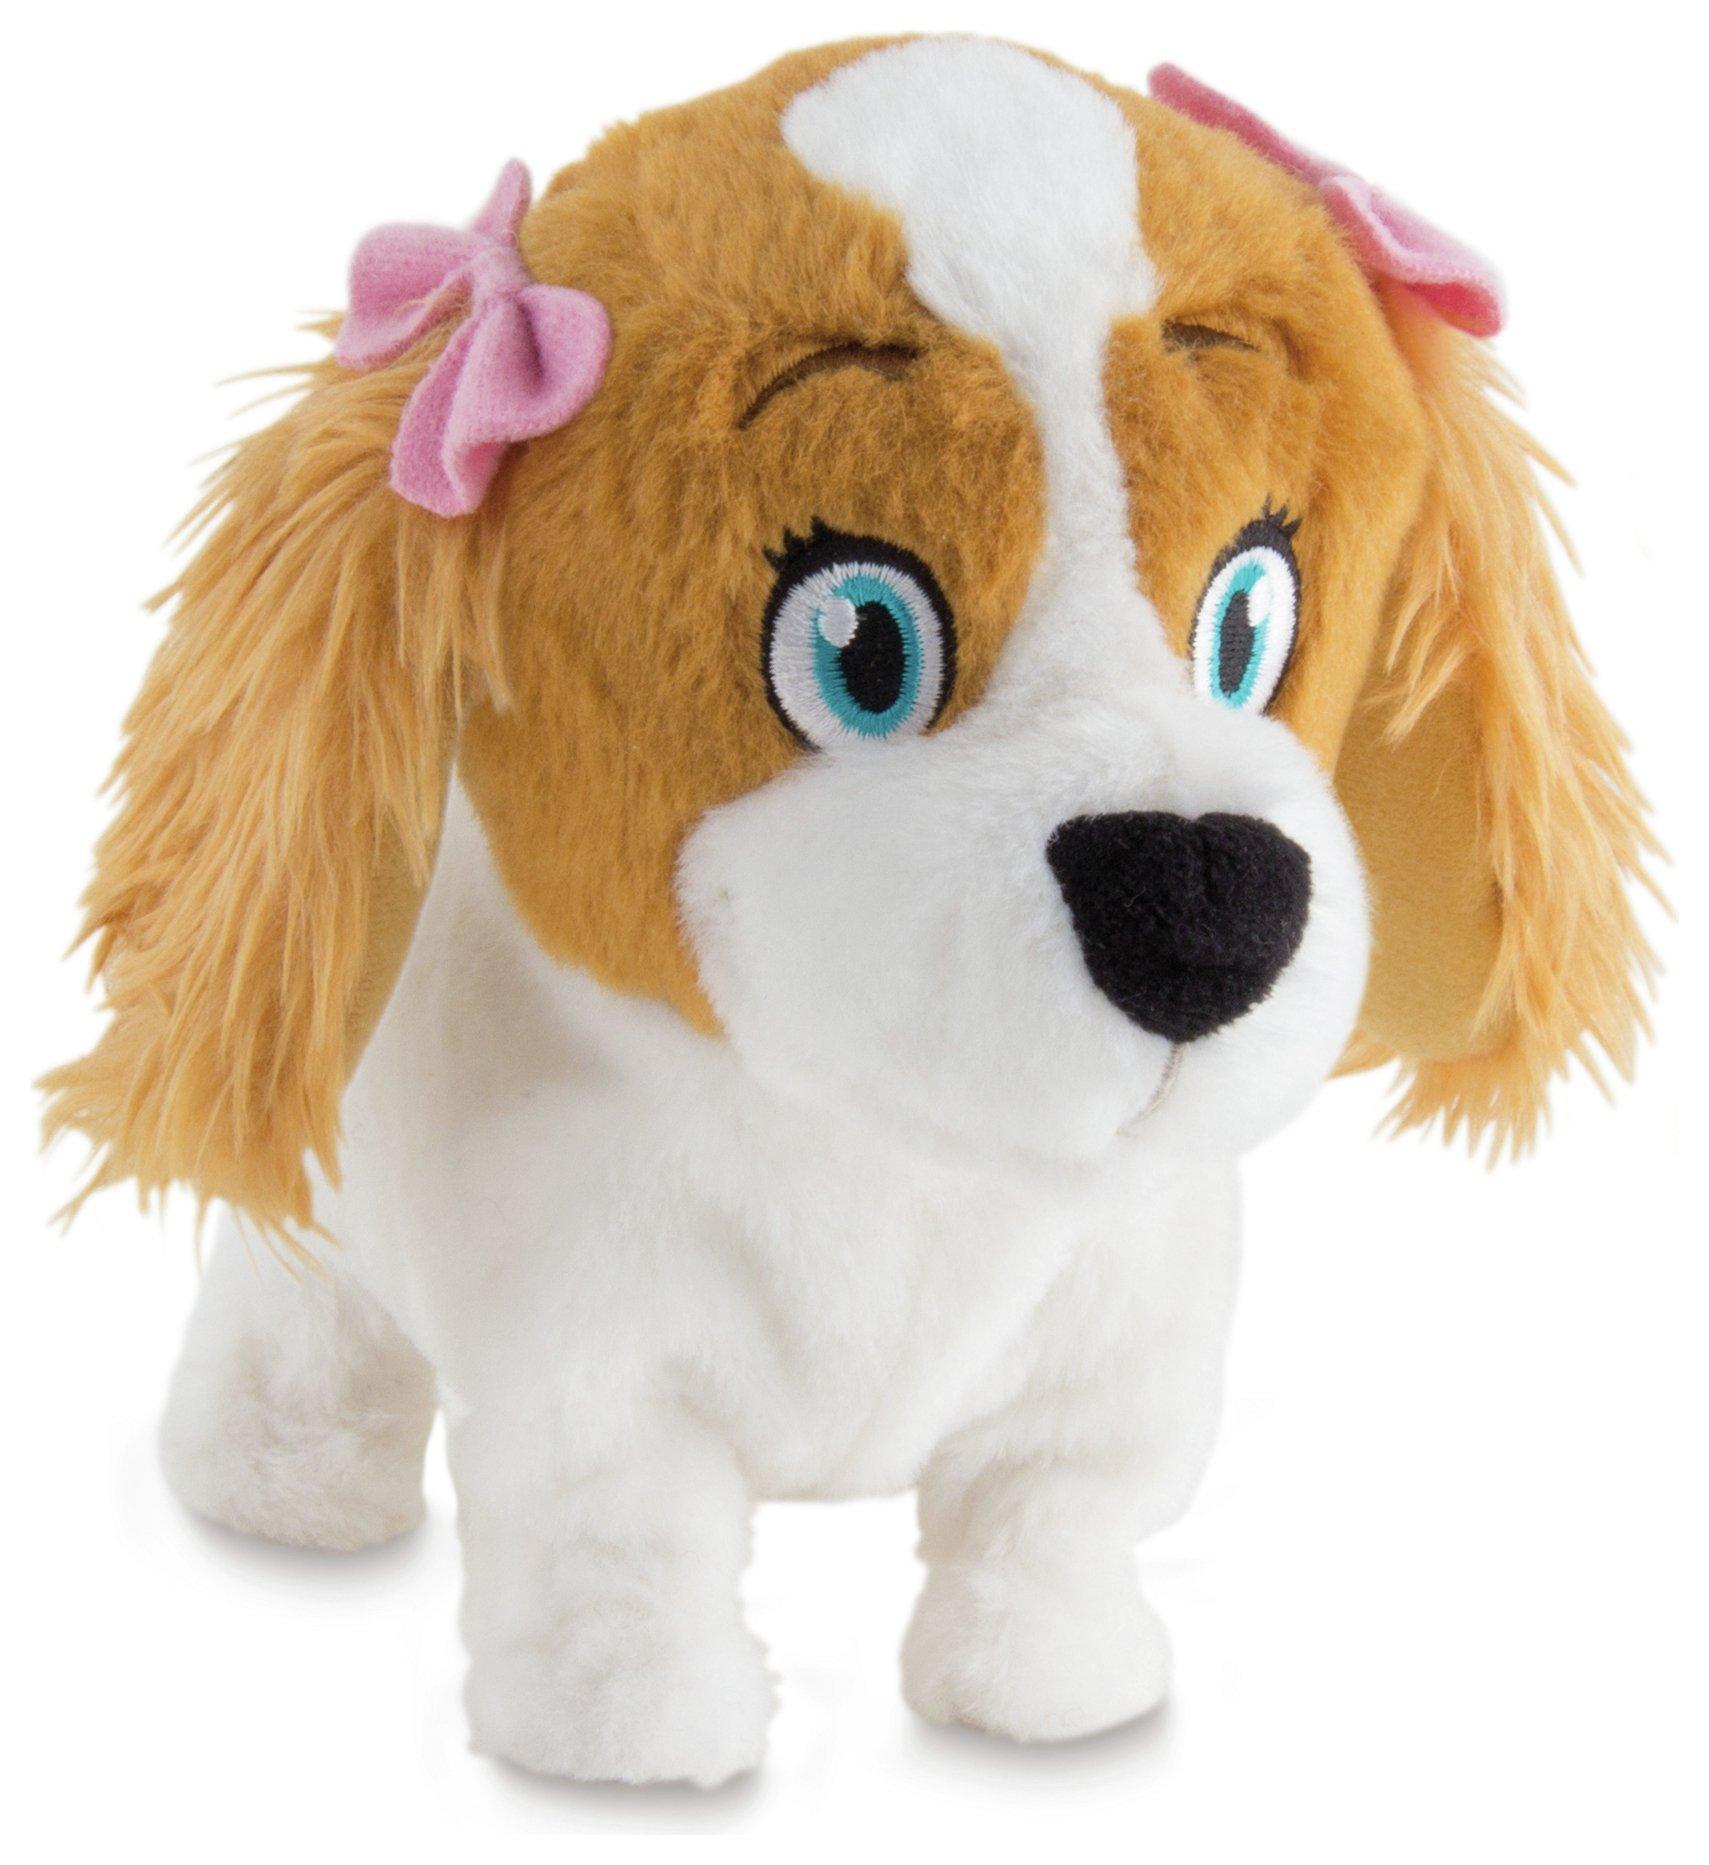 lola the puppy